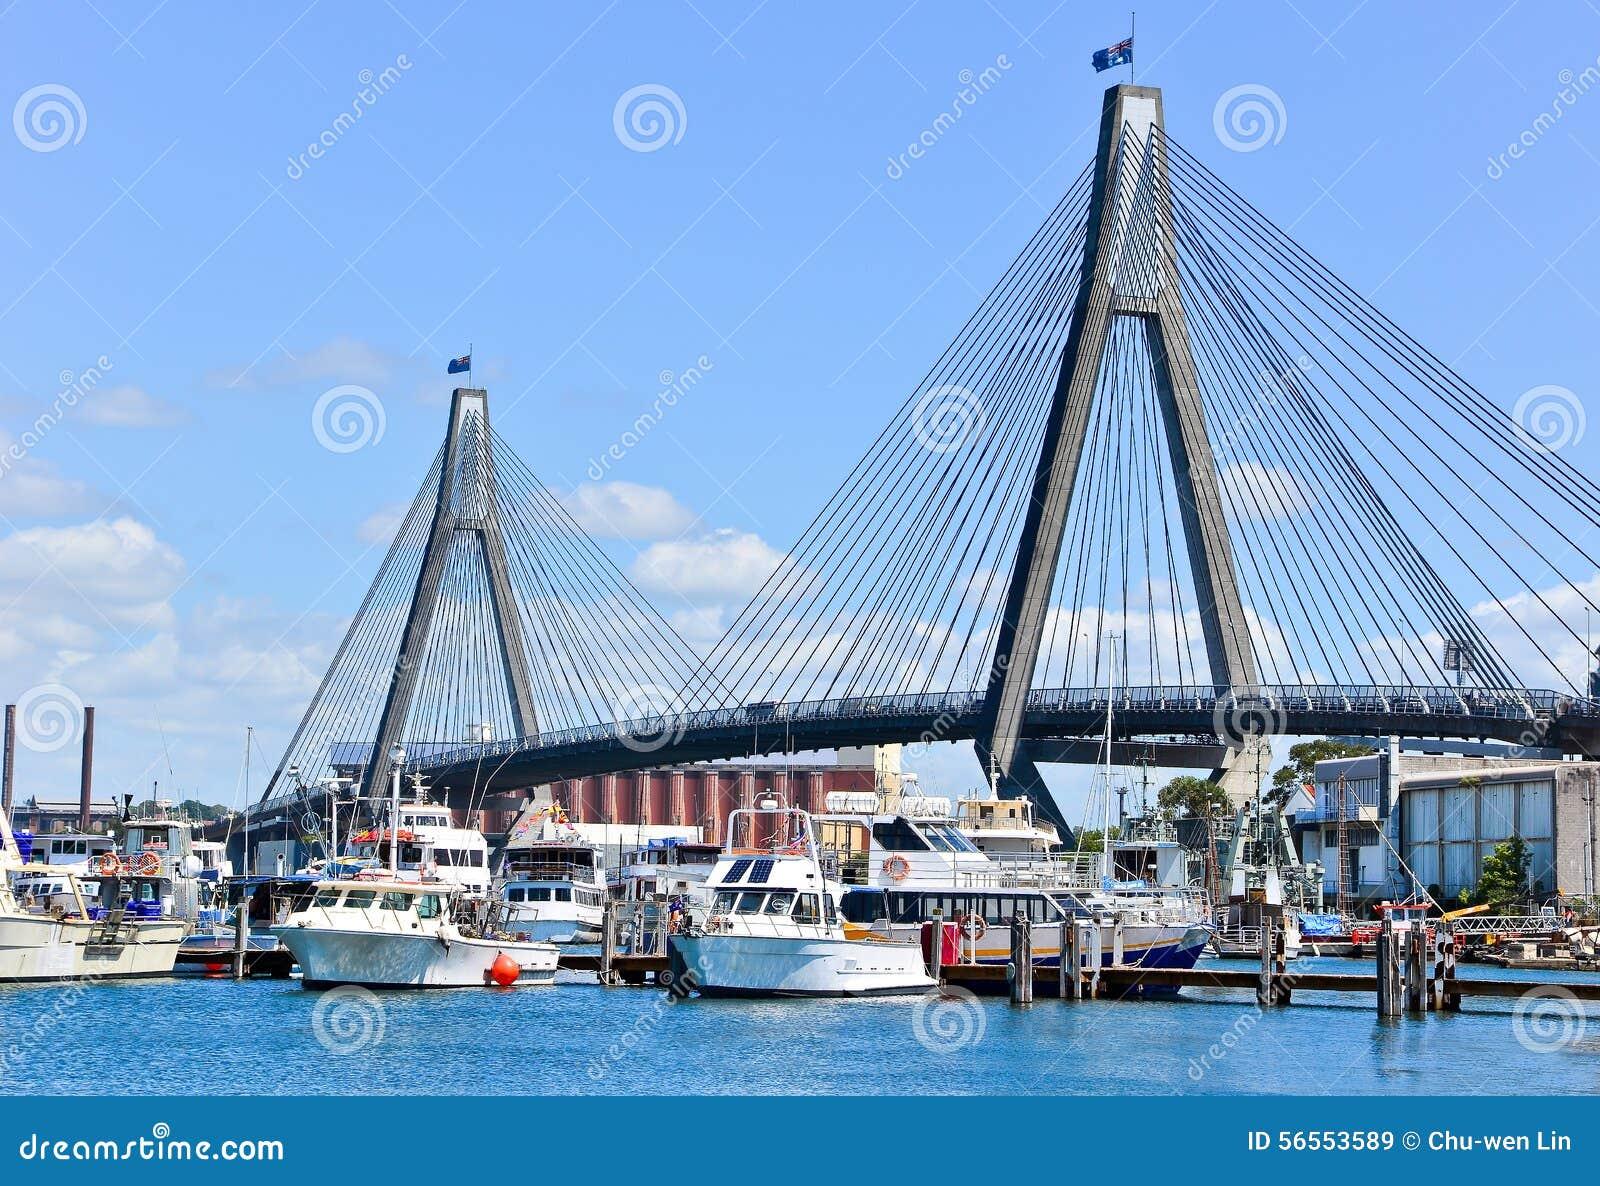 Download Λιμάνι του Σίδνεϊ στο Σίδνεϊ Στοκ Εικόνα - εικόνα από μητρόπολη, μονοπάτι: 56553589